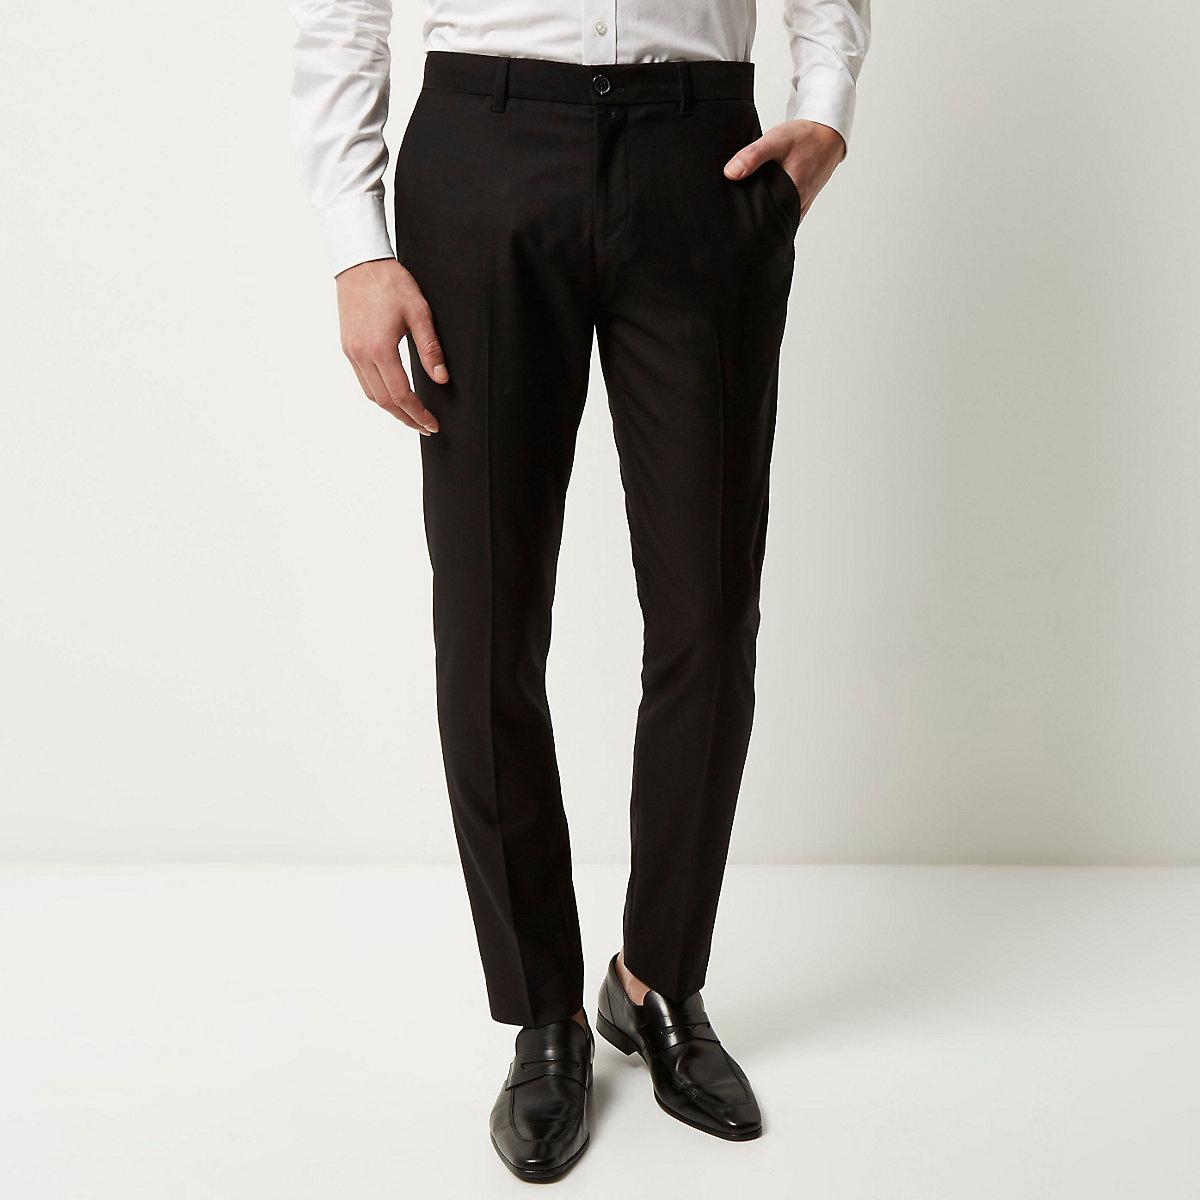 Black smart skinny trousers